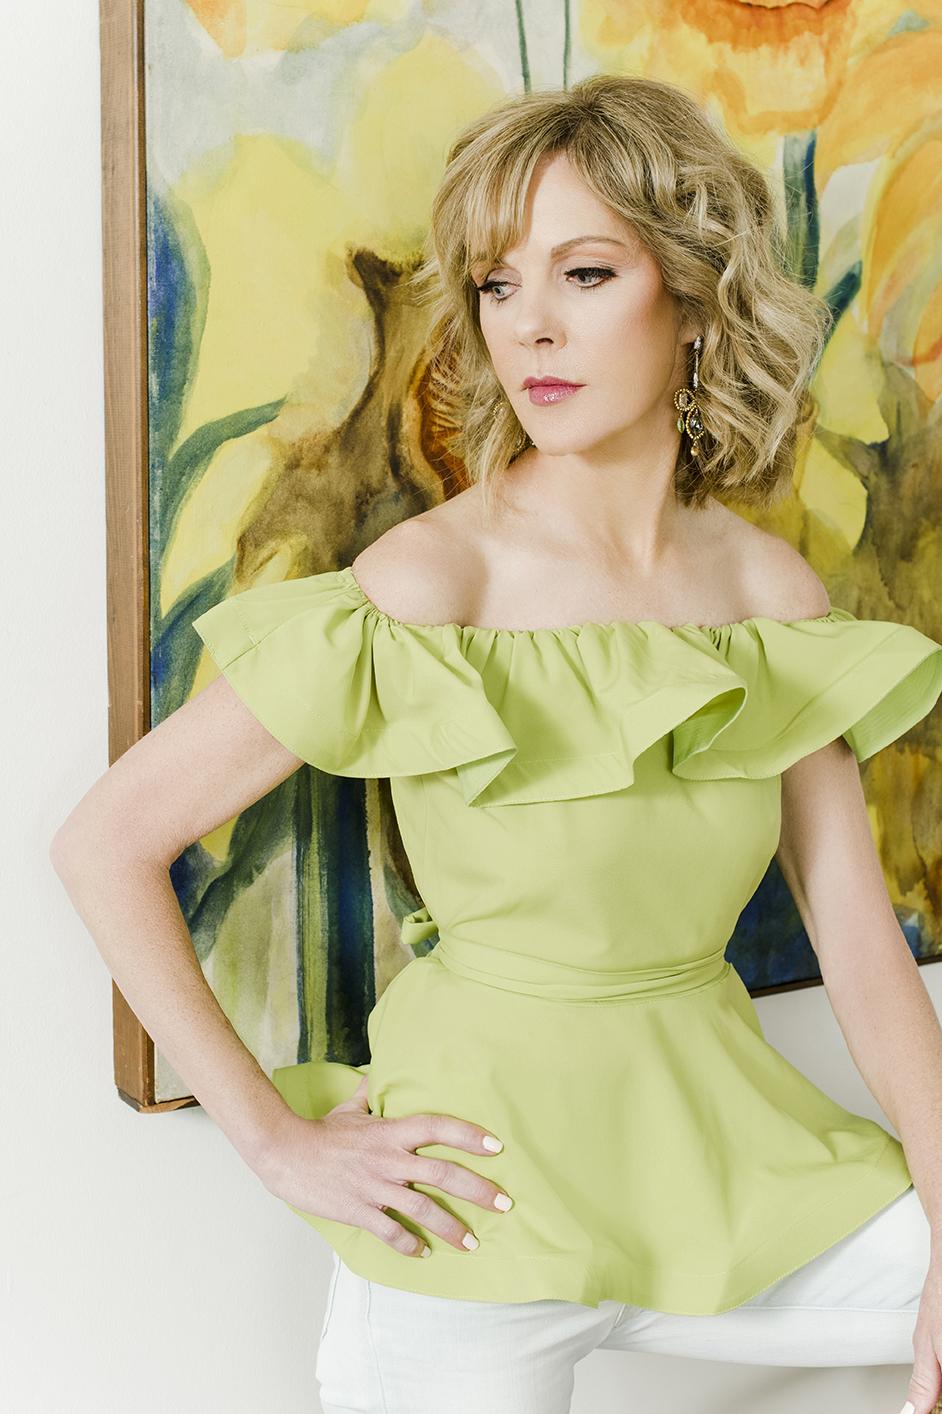 Jody Hudson - Alex Hudson Lyme Foundation